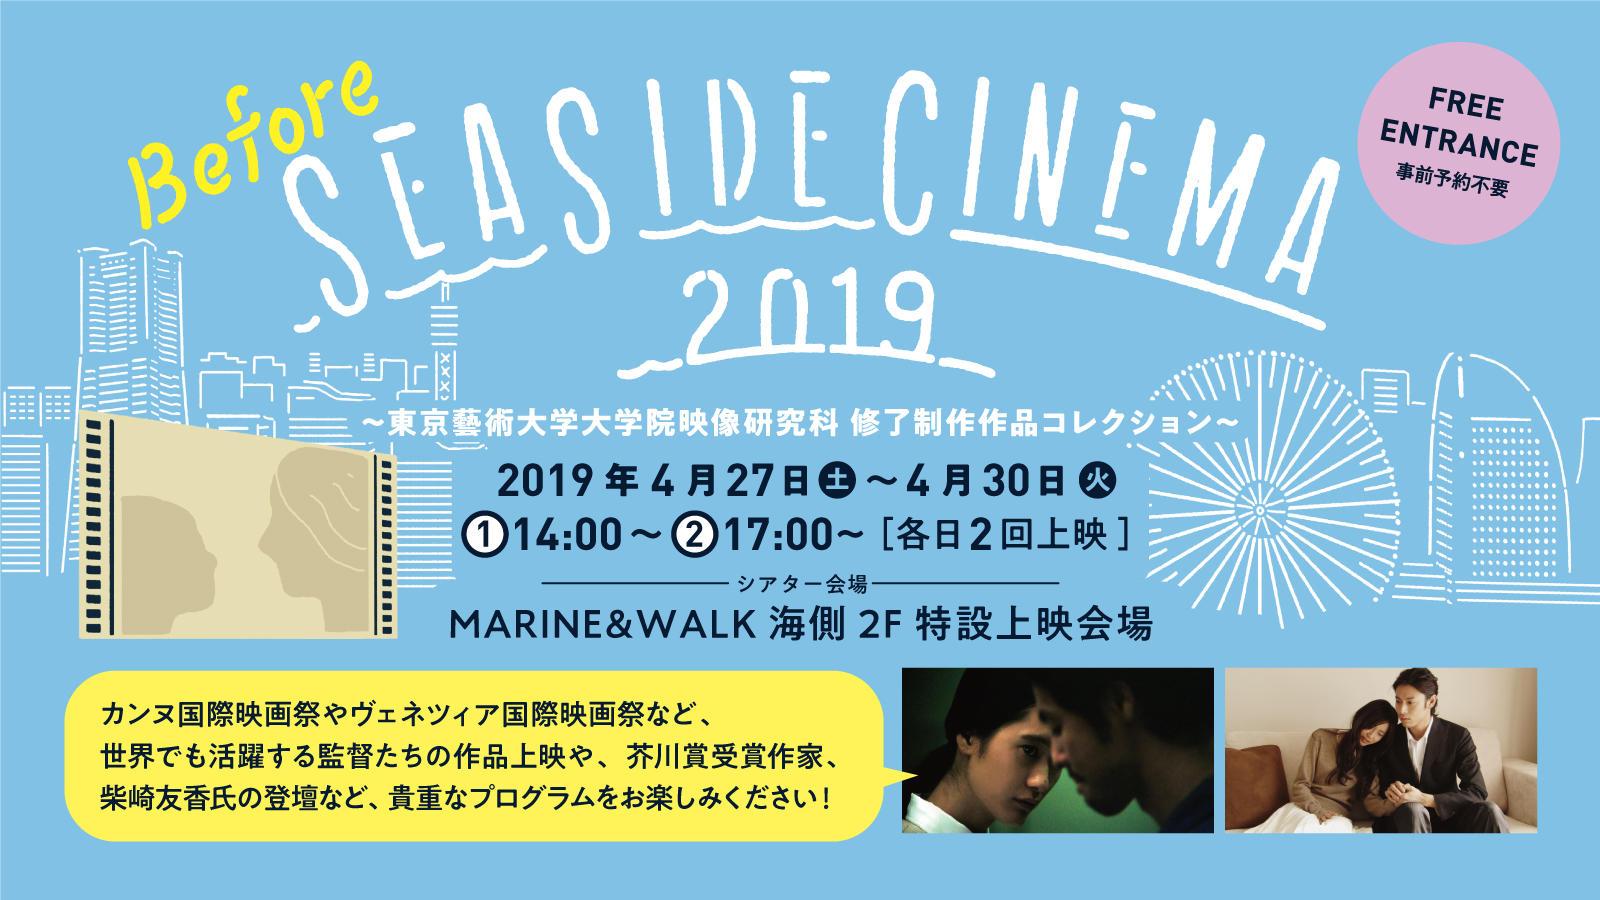 2019.4.27sut-4.30tue Before SEASIDE CINEMA2019